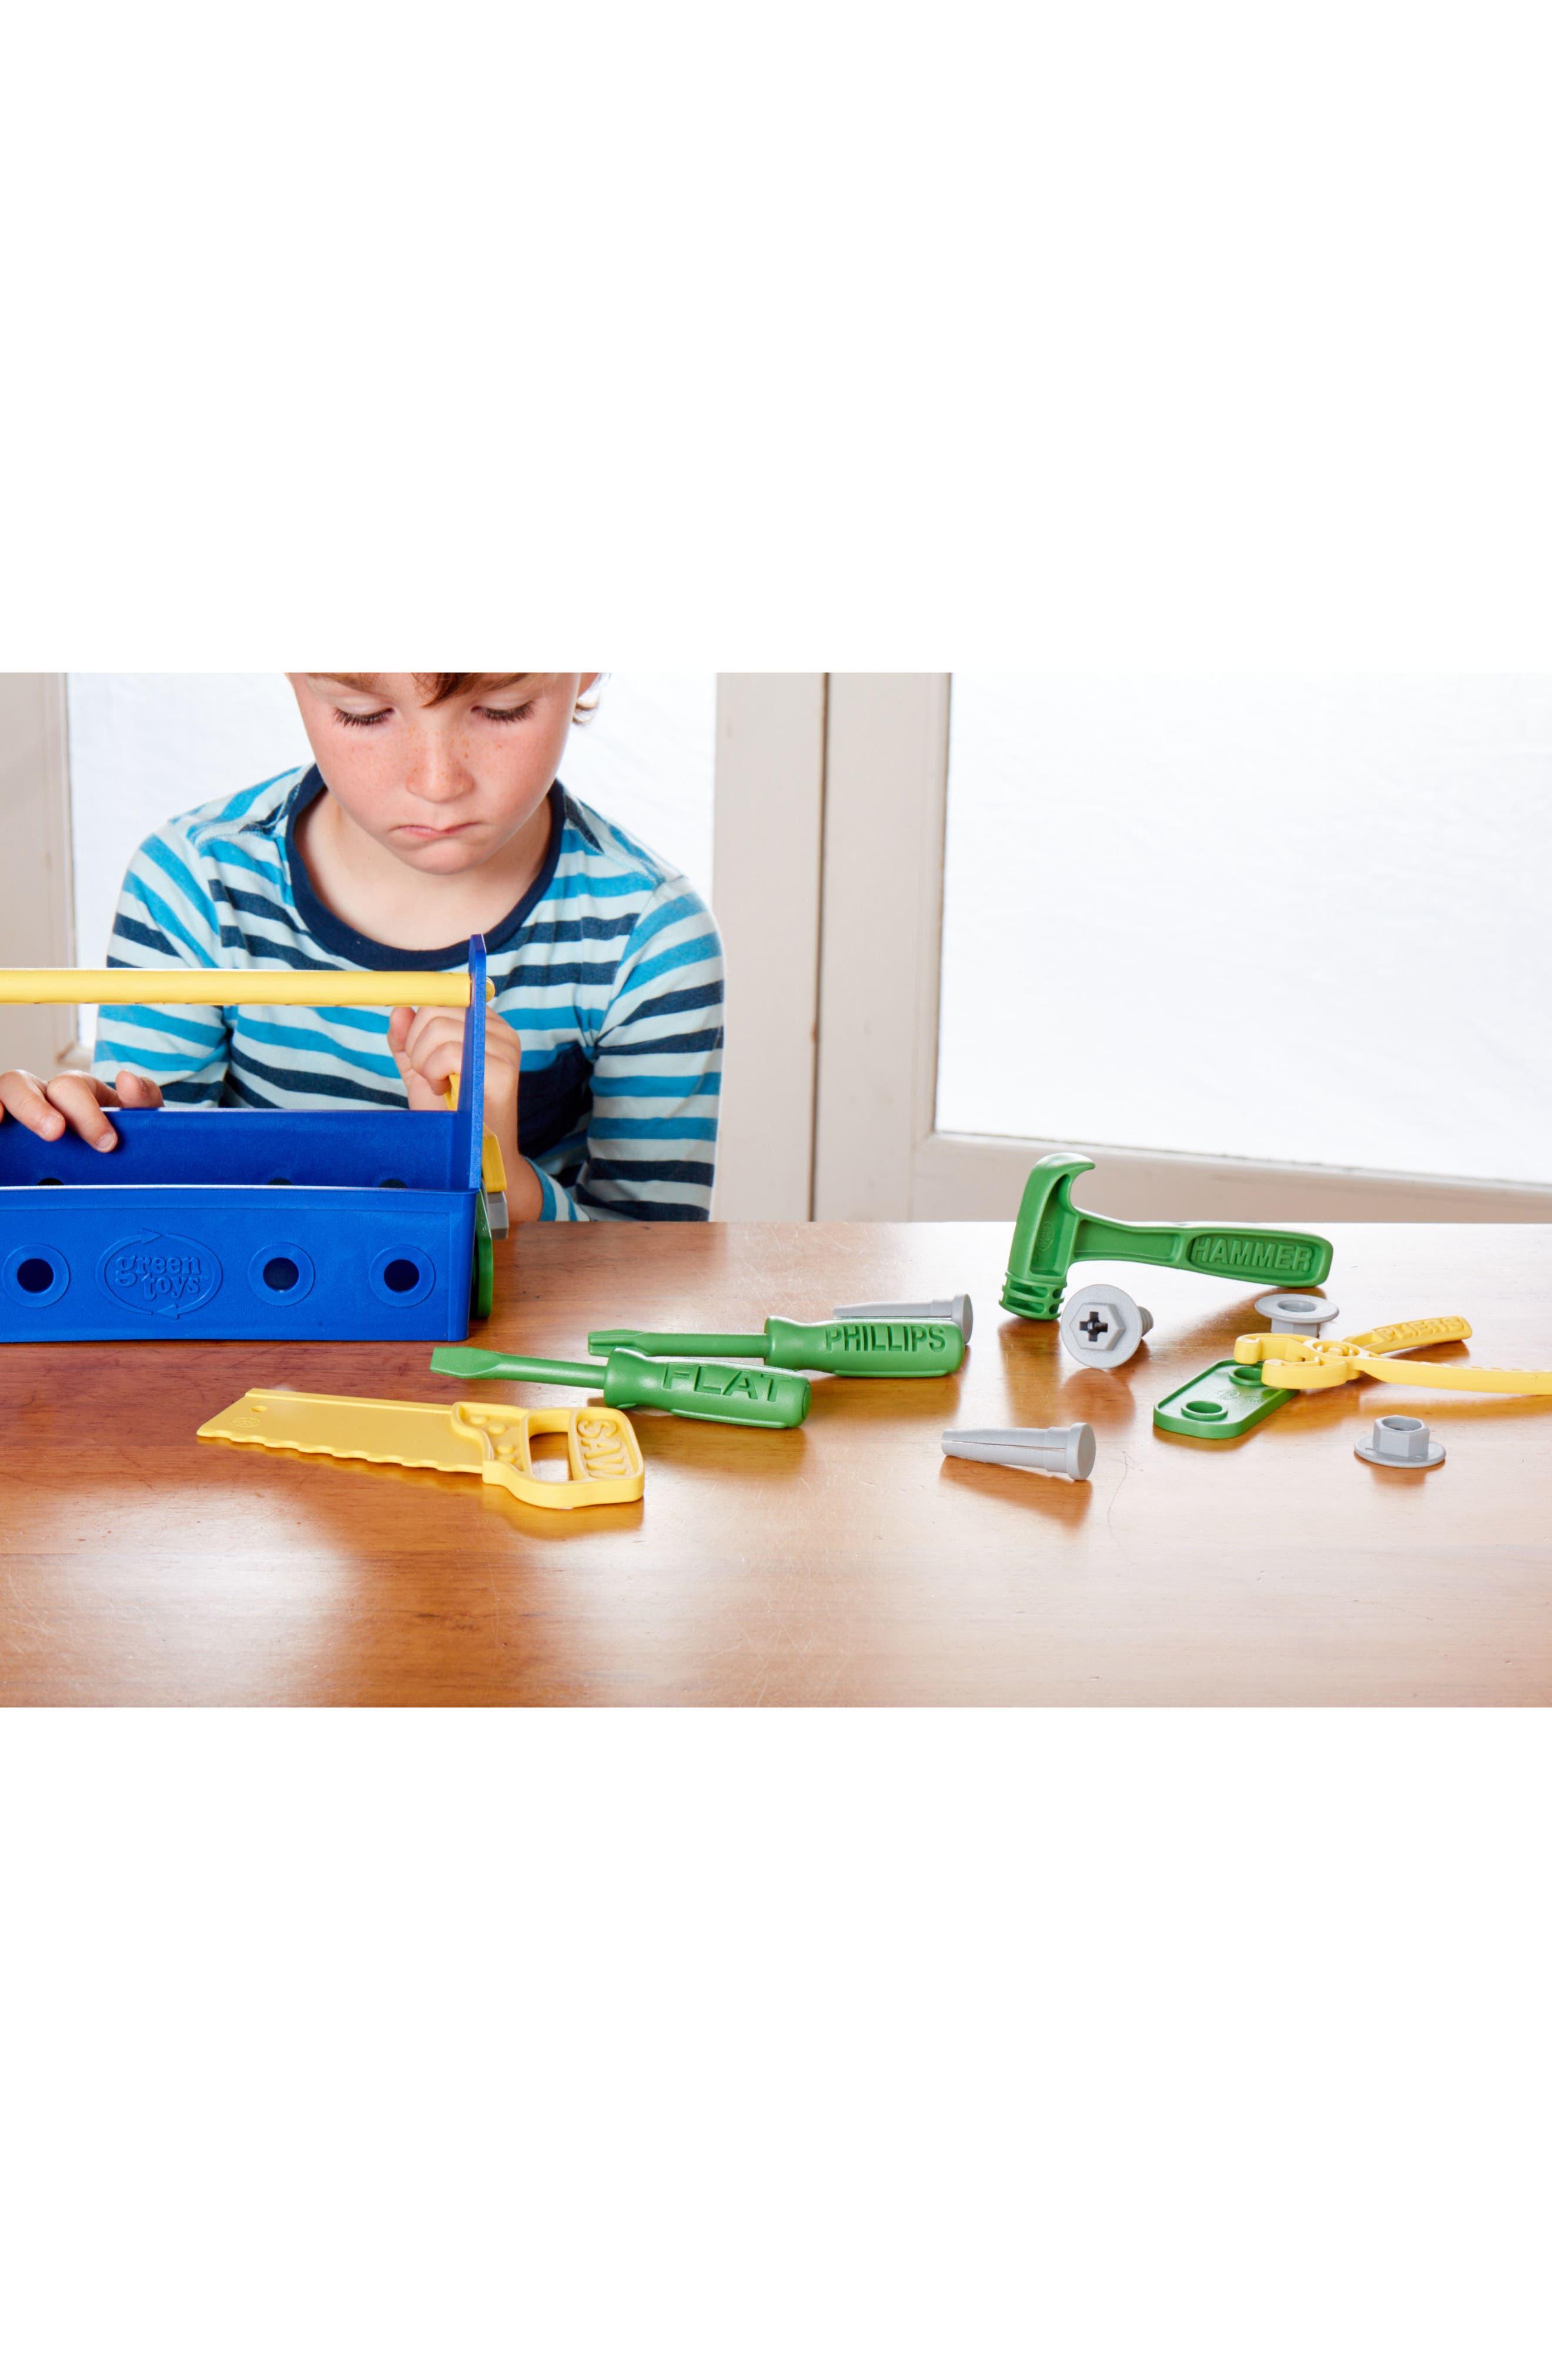 15-Piece Plastic Tool Set,                             Alternate thumbnail 3, color,                             Blue